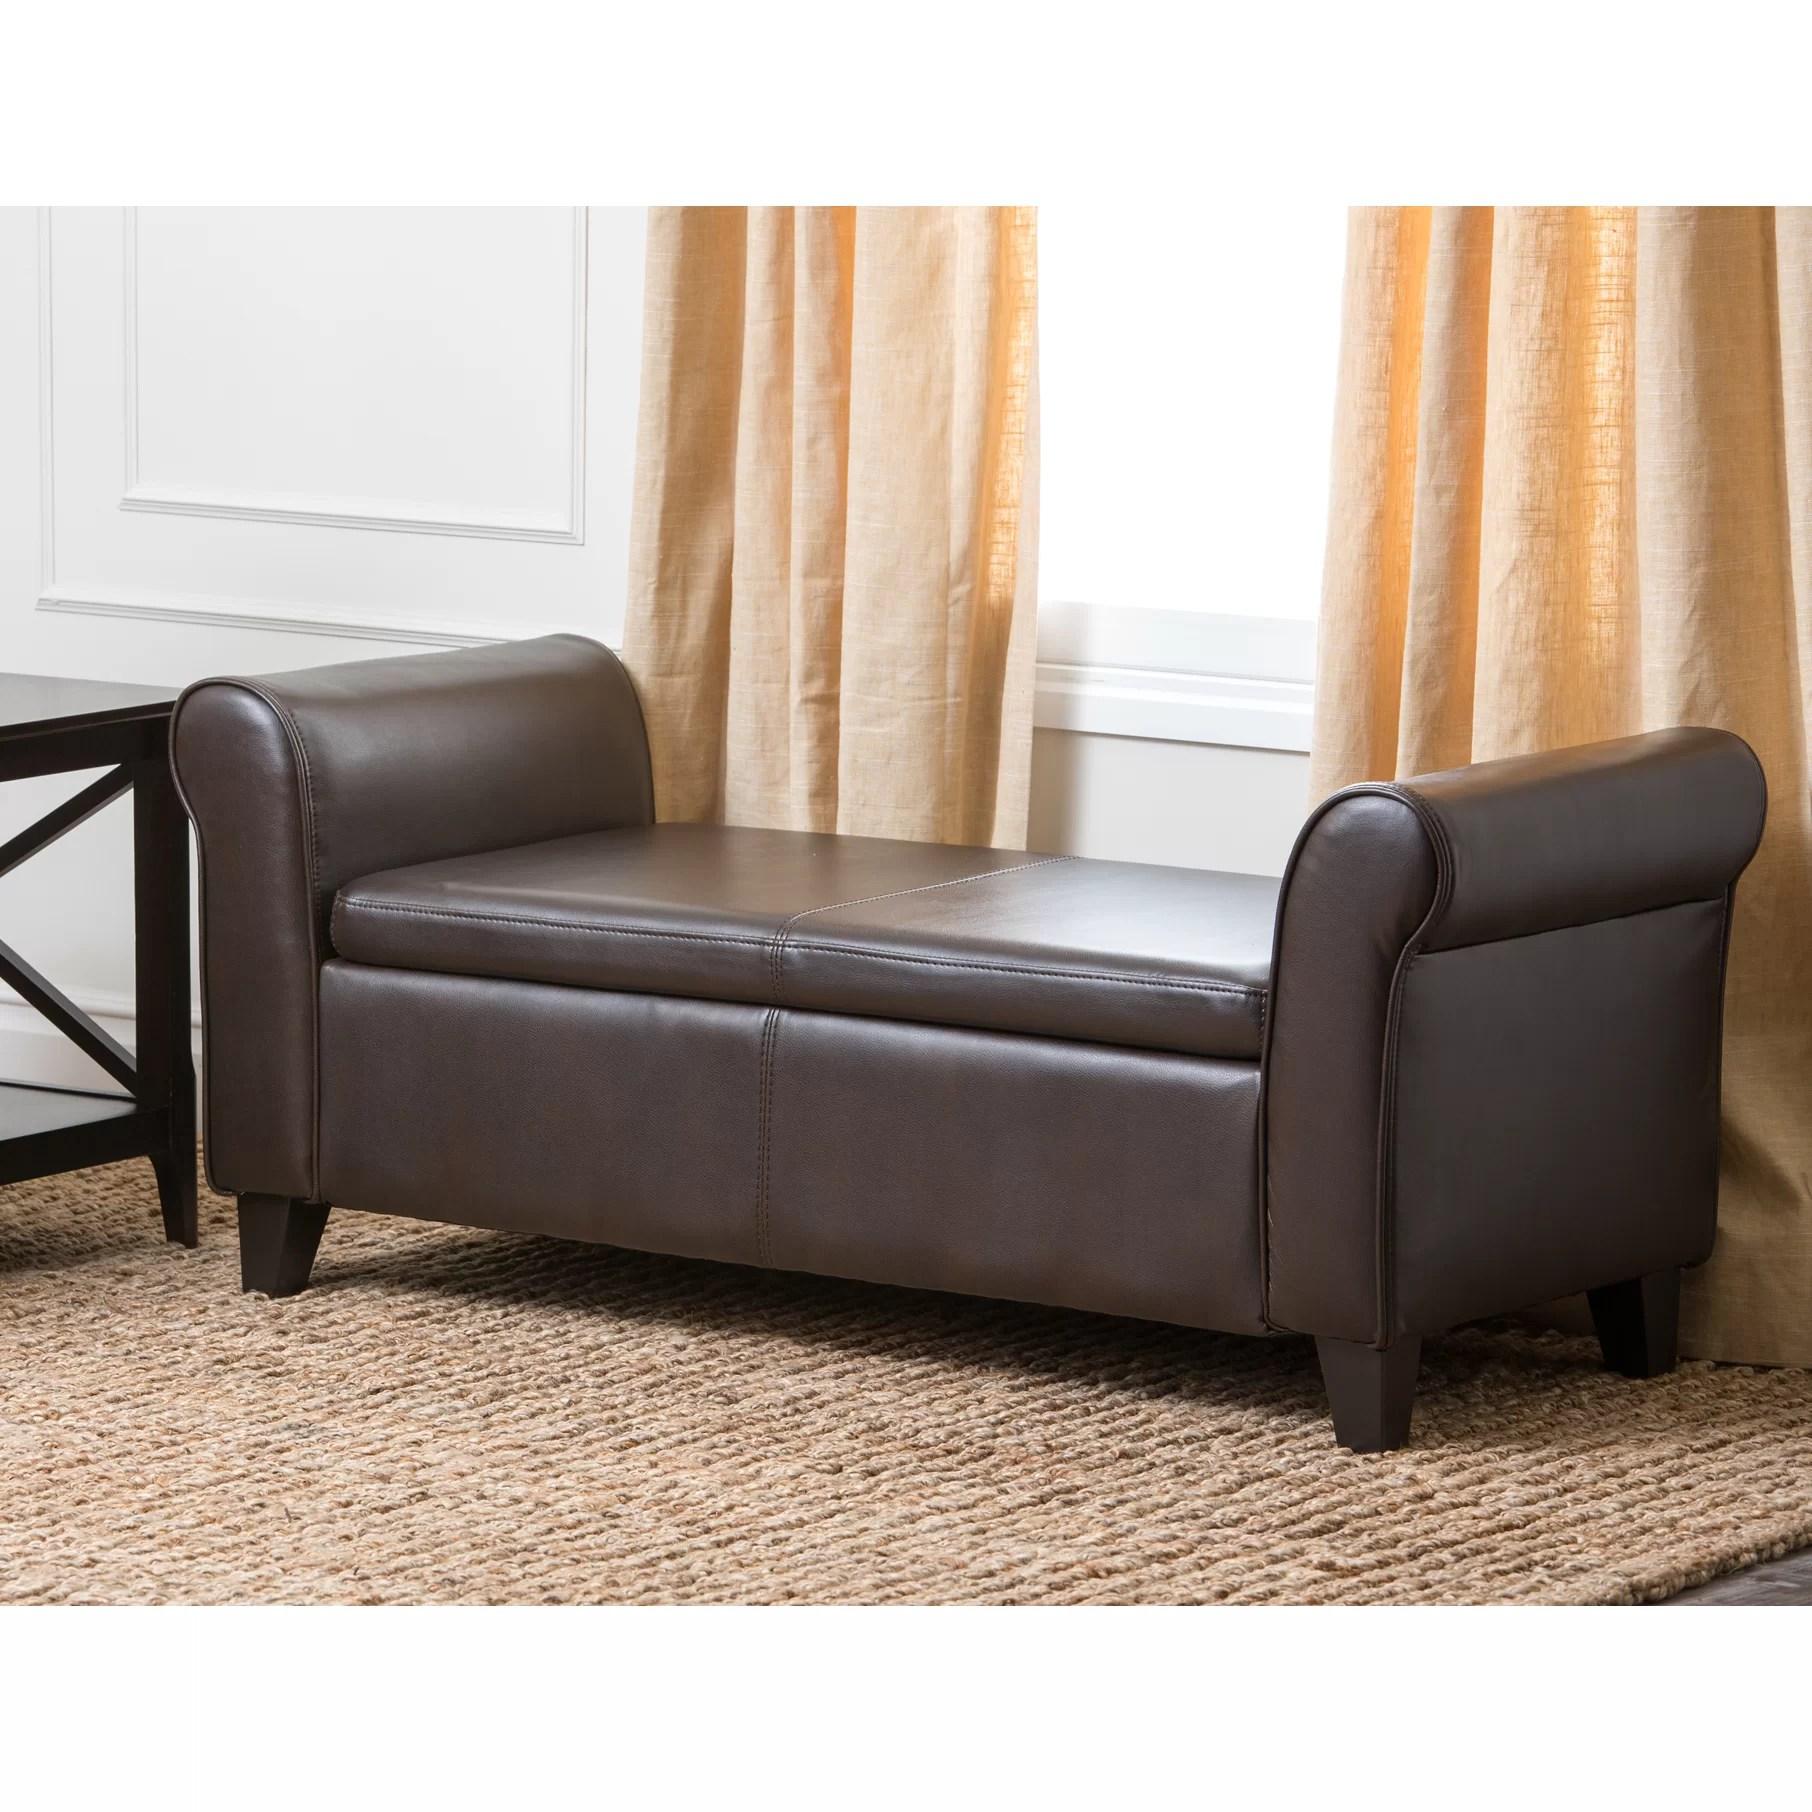 Alcott Hill Varian Upholstered Storage Bedroom Bench: Bedroom Storage Benches